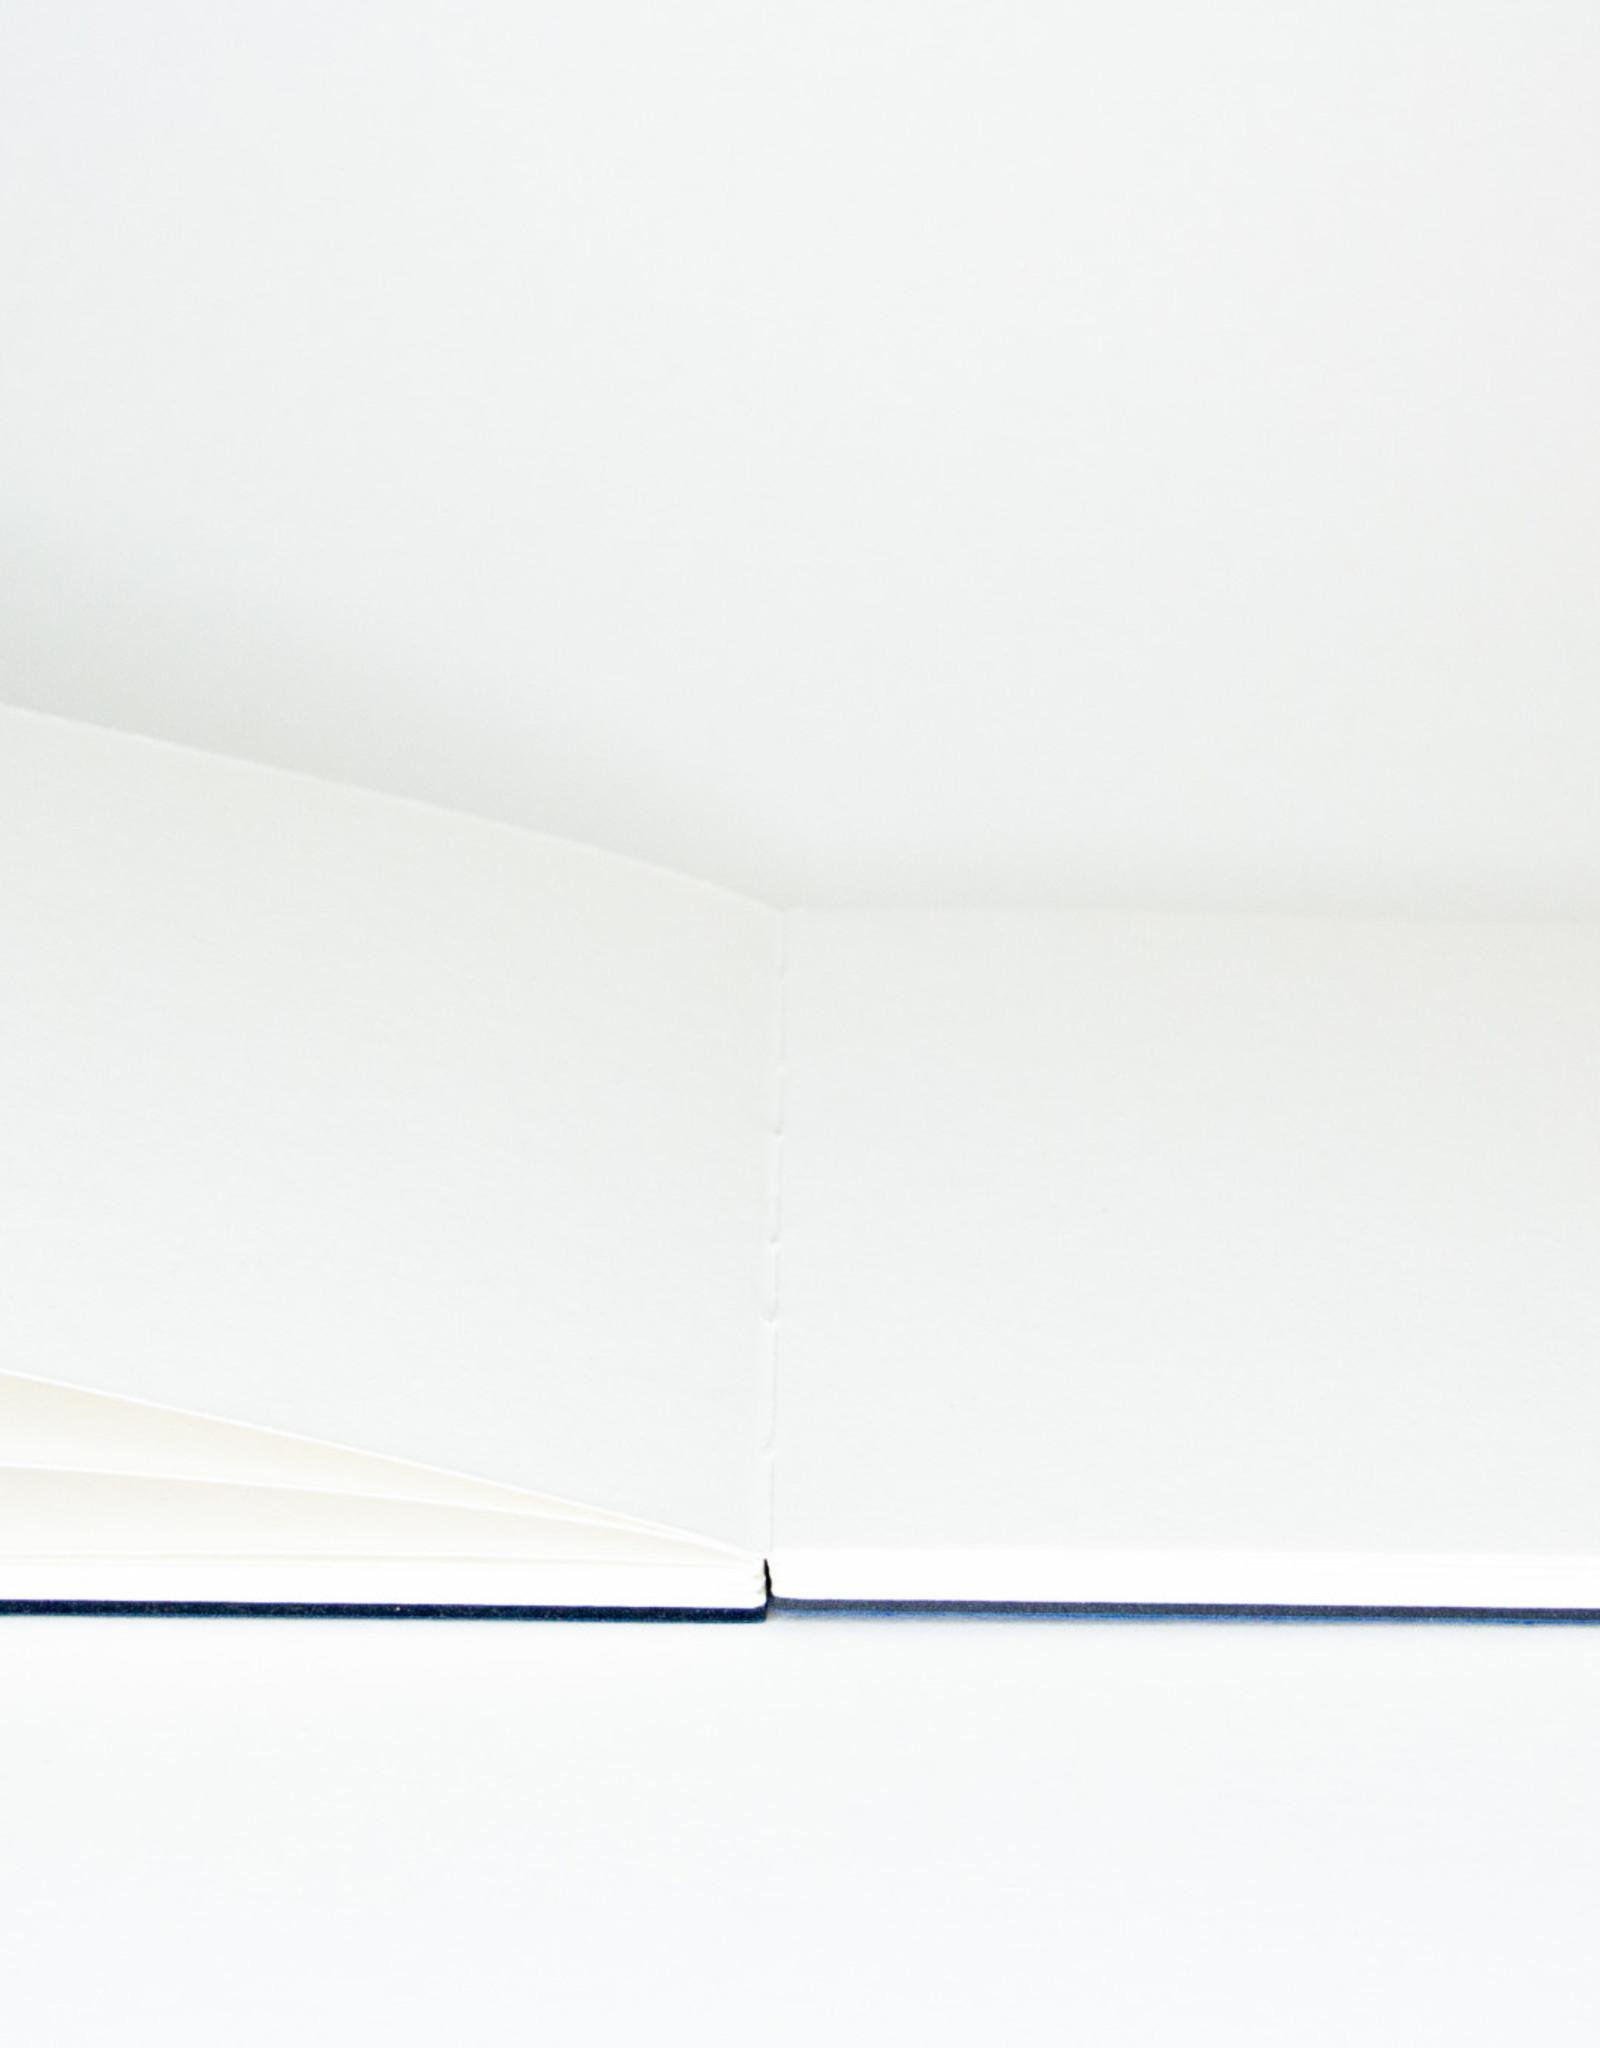 "SMLT Layflat Watercolor Sketch Album, White, 5.5"" x 5.5"", 280gsm, 24 Sheets"